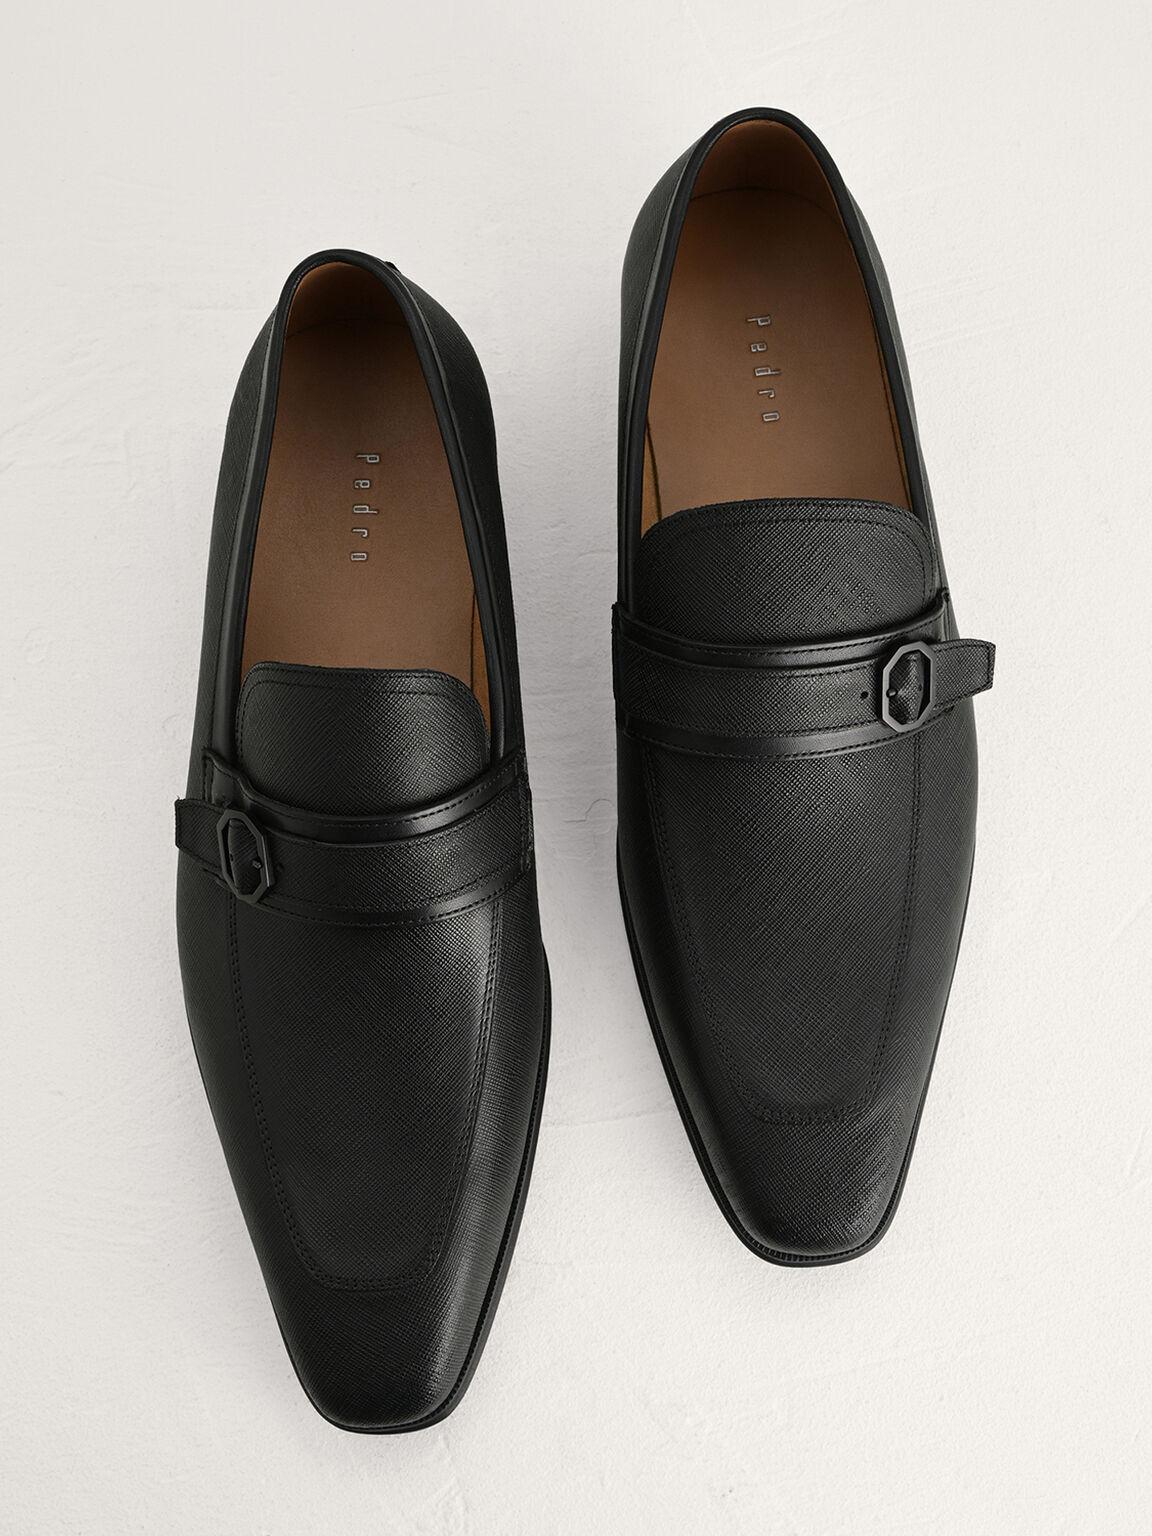 Buckled Leather Loafers, Black, hi-res